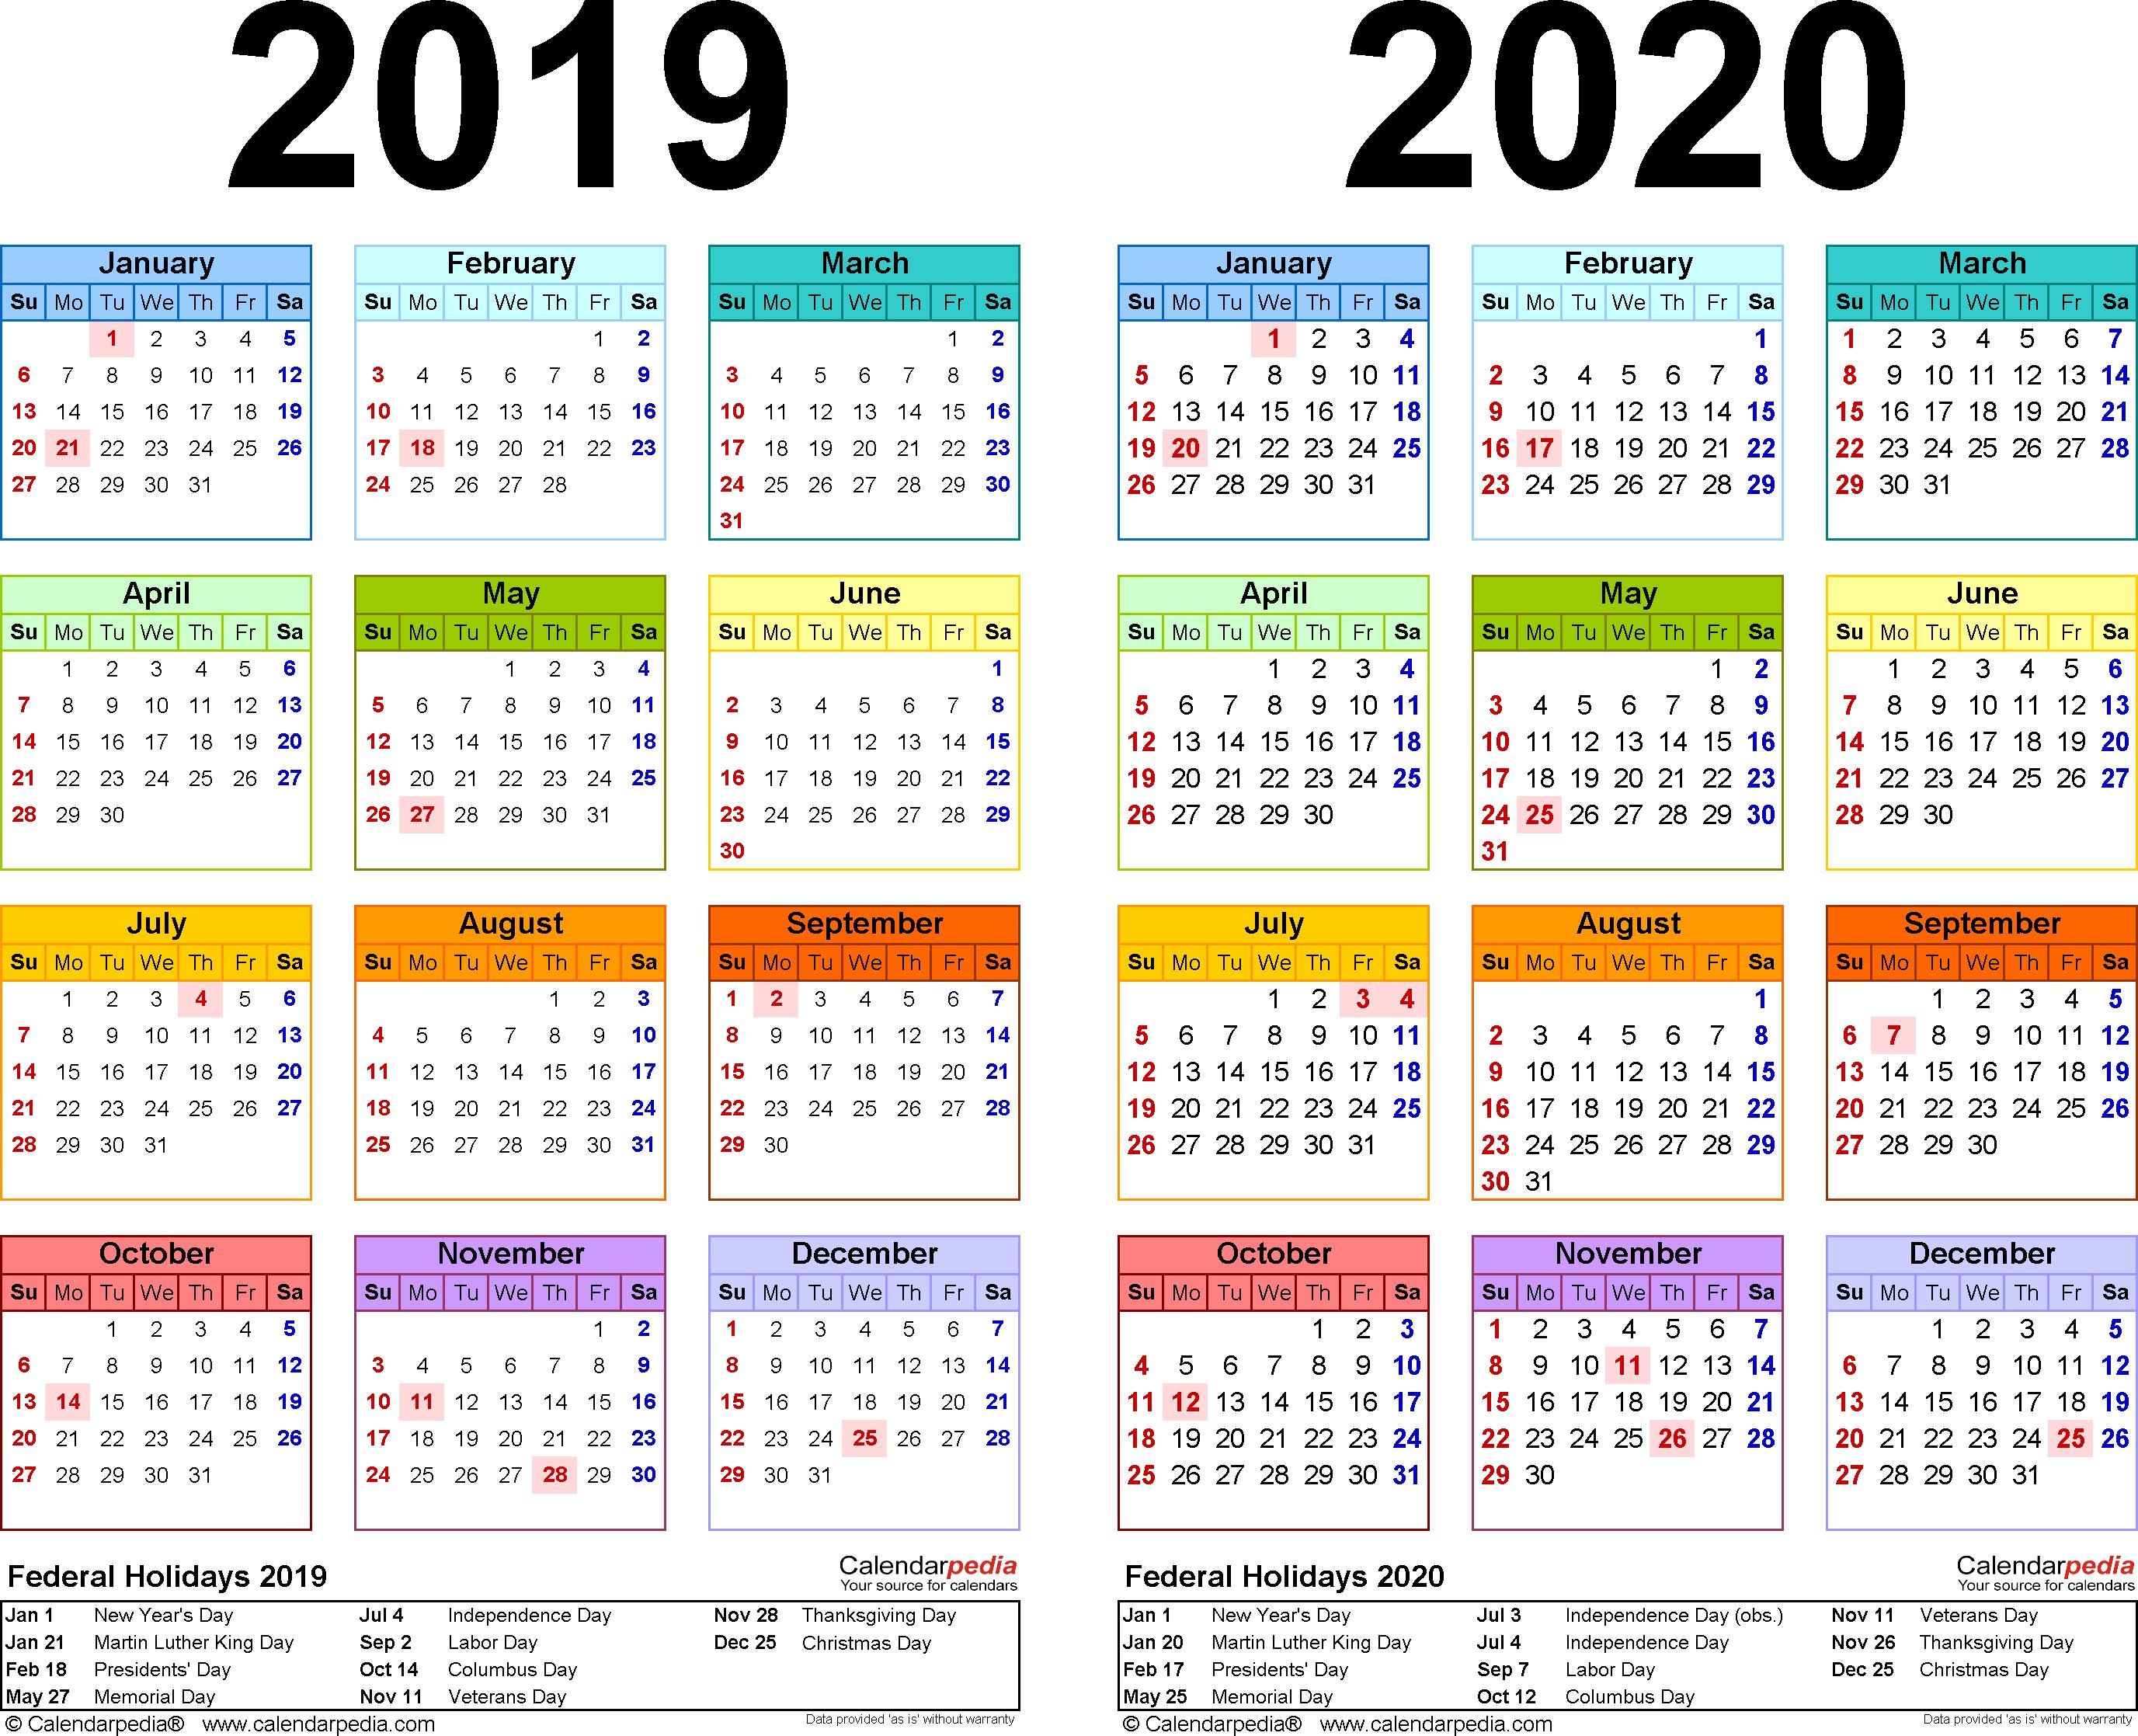 2019-2020 Calendar - Free Printable Two-Year Pdf Calendars inside Year At A Glance Calendar2019-2020 Free Printable